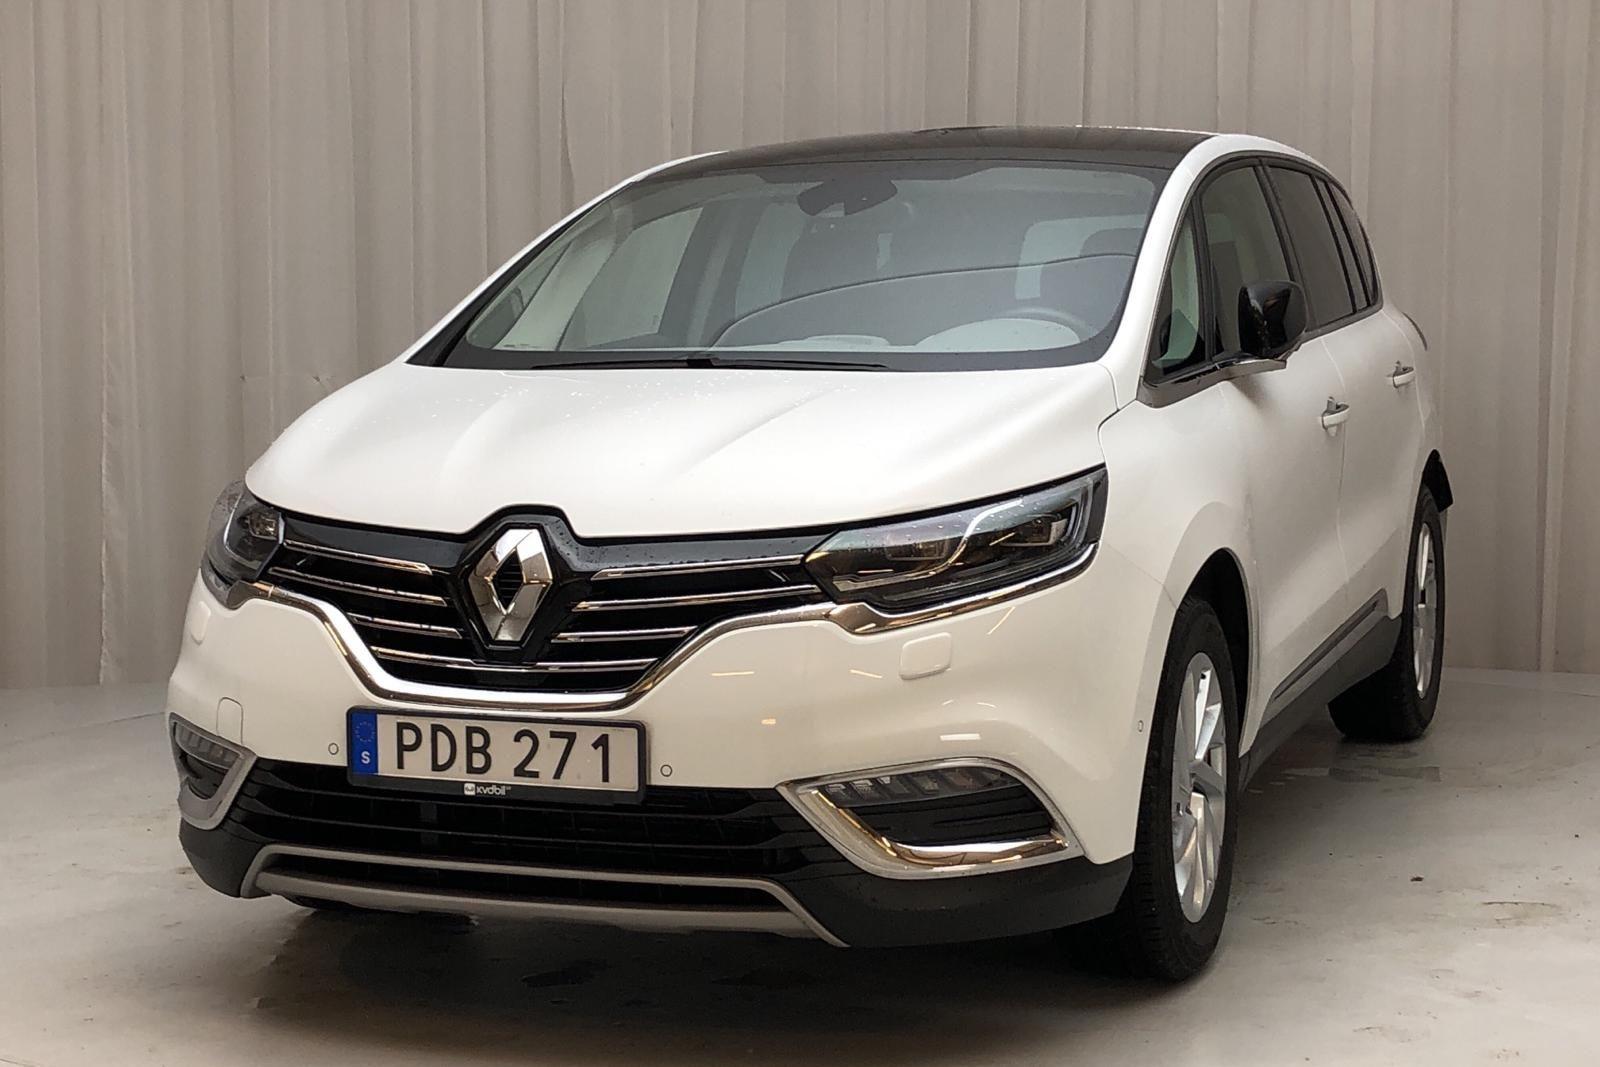 Renault Espace 1.6 dCi (130hk)